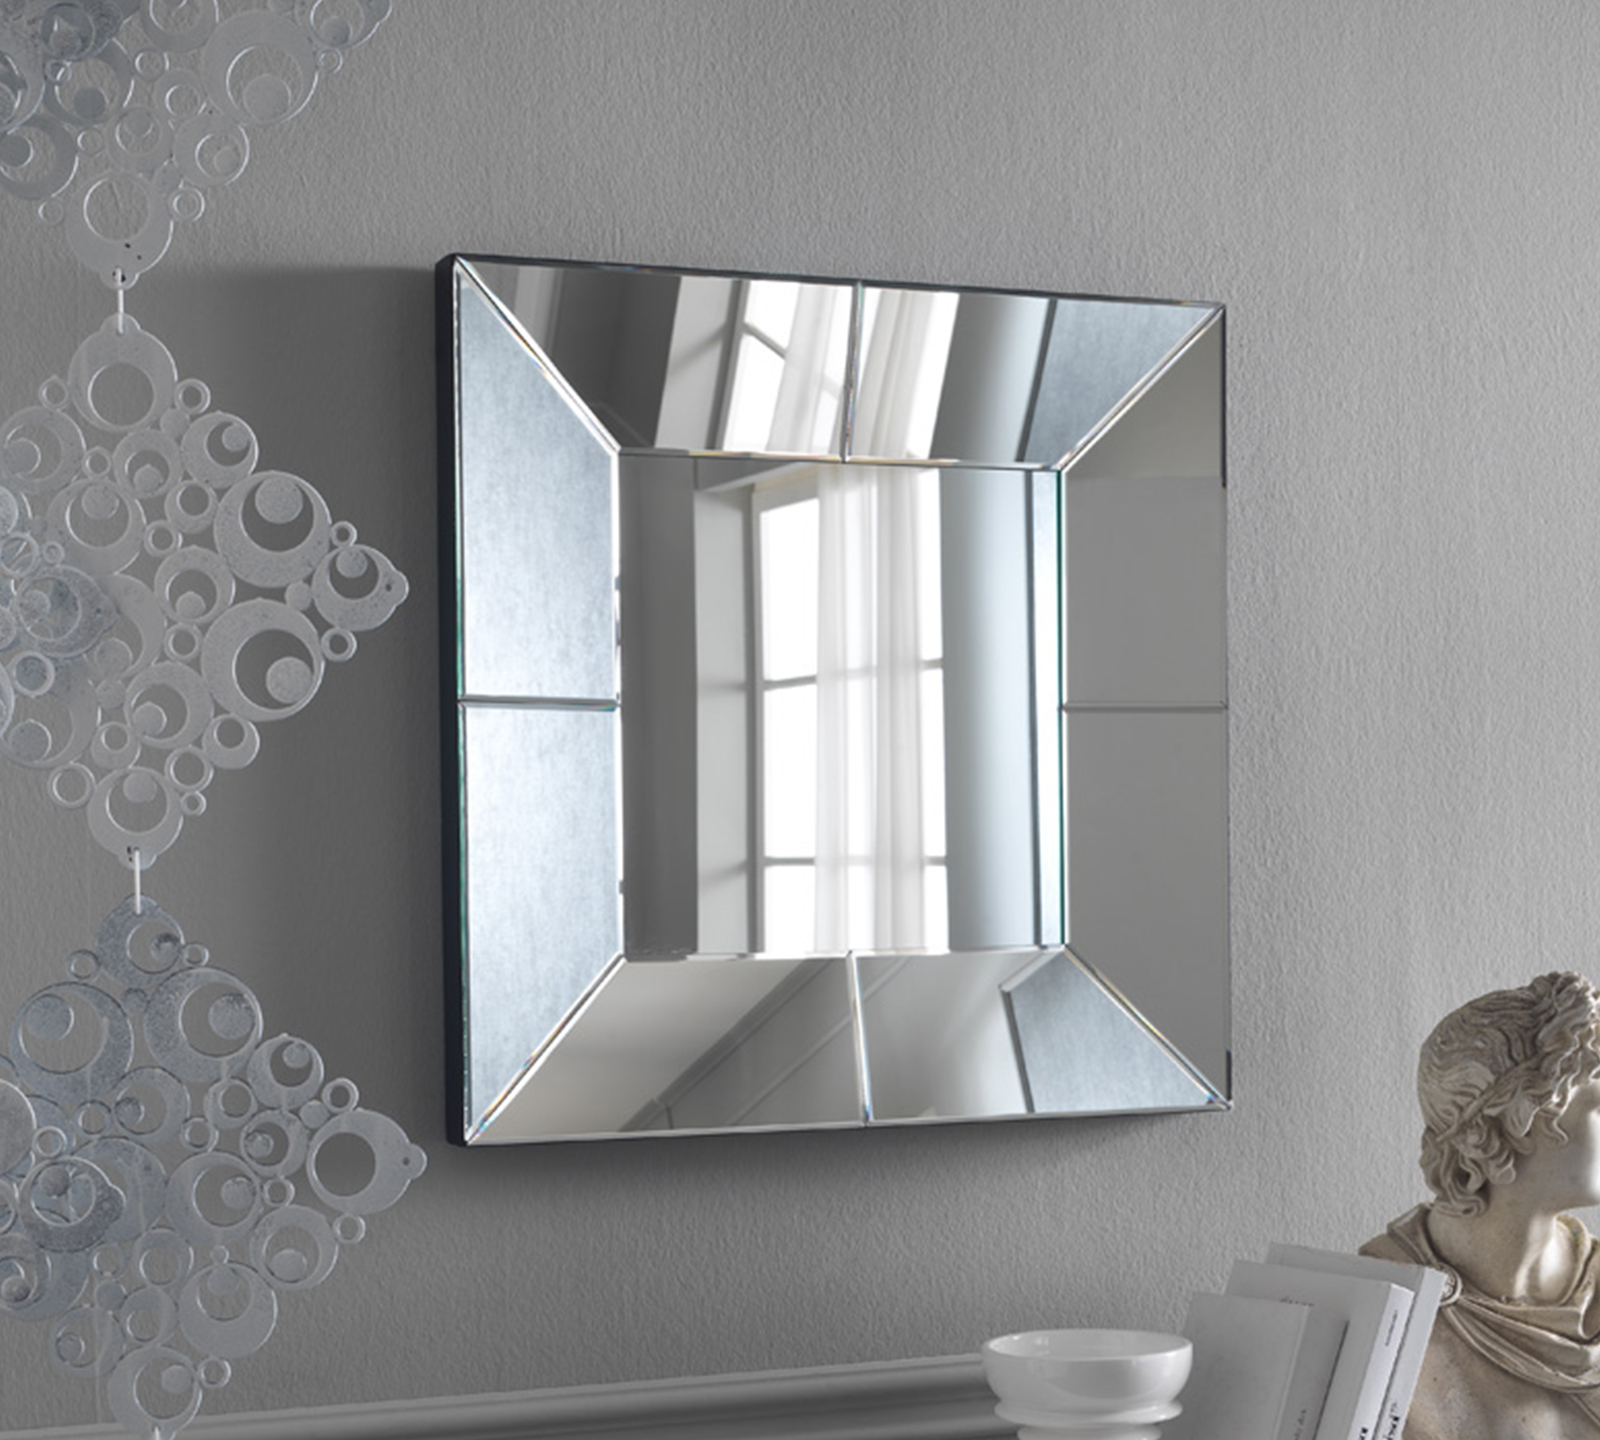 Specchio sp 017 duzzle - Offerte specchi ...